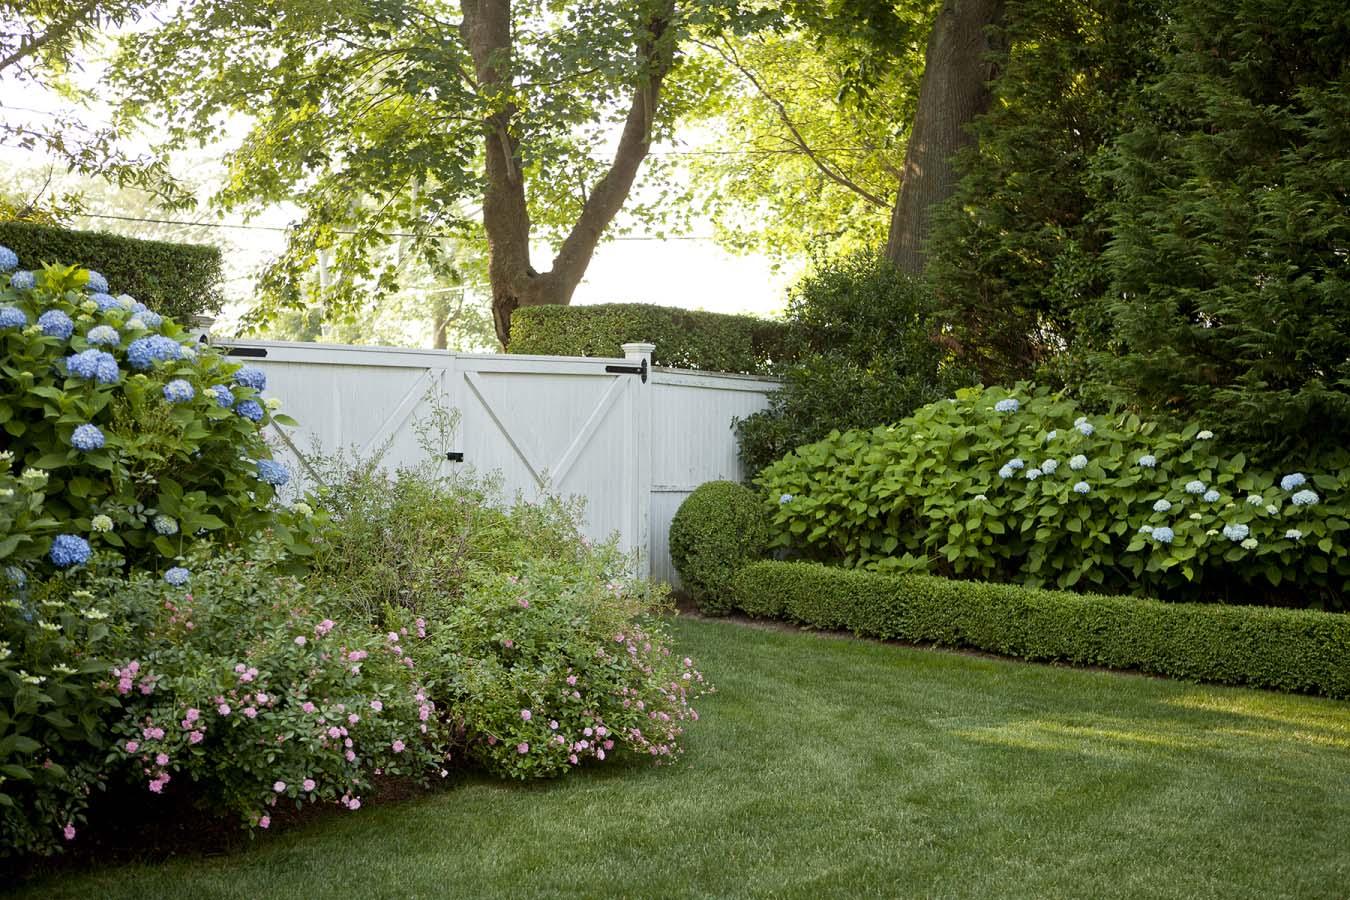 Coastal style beachy hamptons home part 2 for Hamptons home and garden design penarth